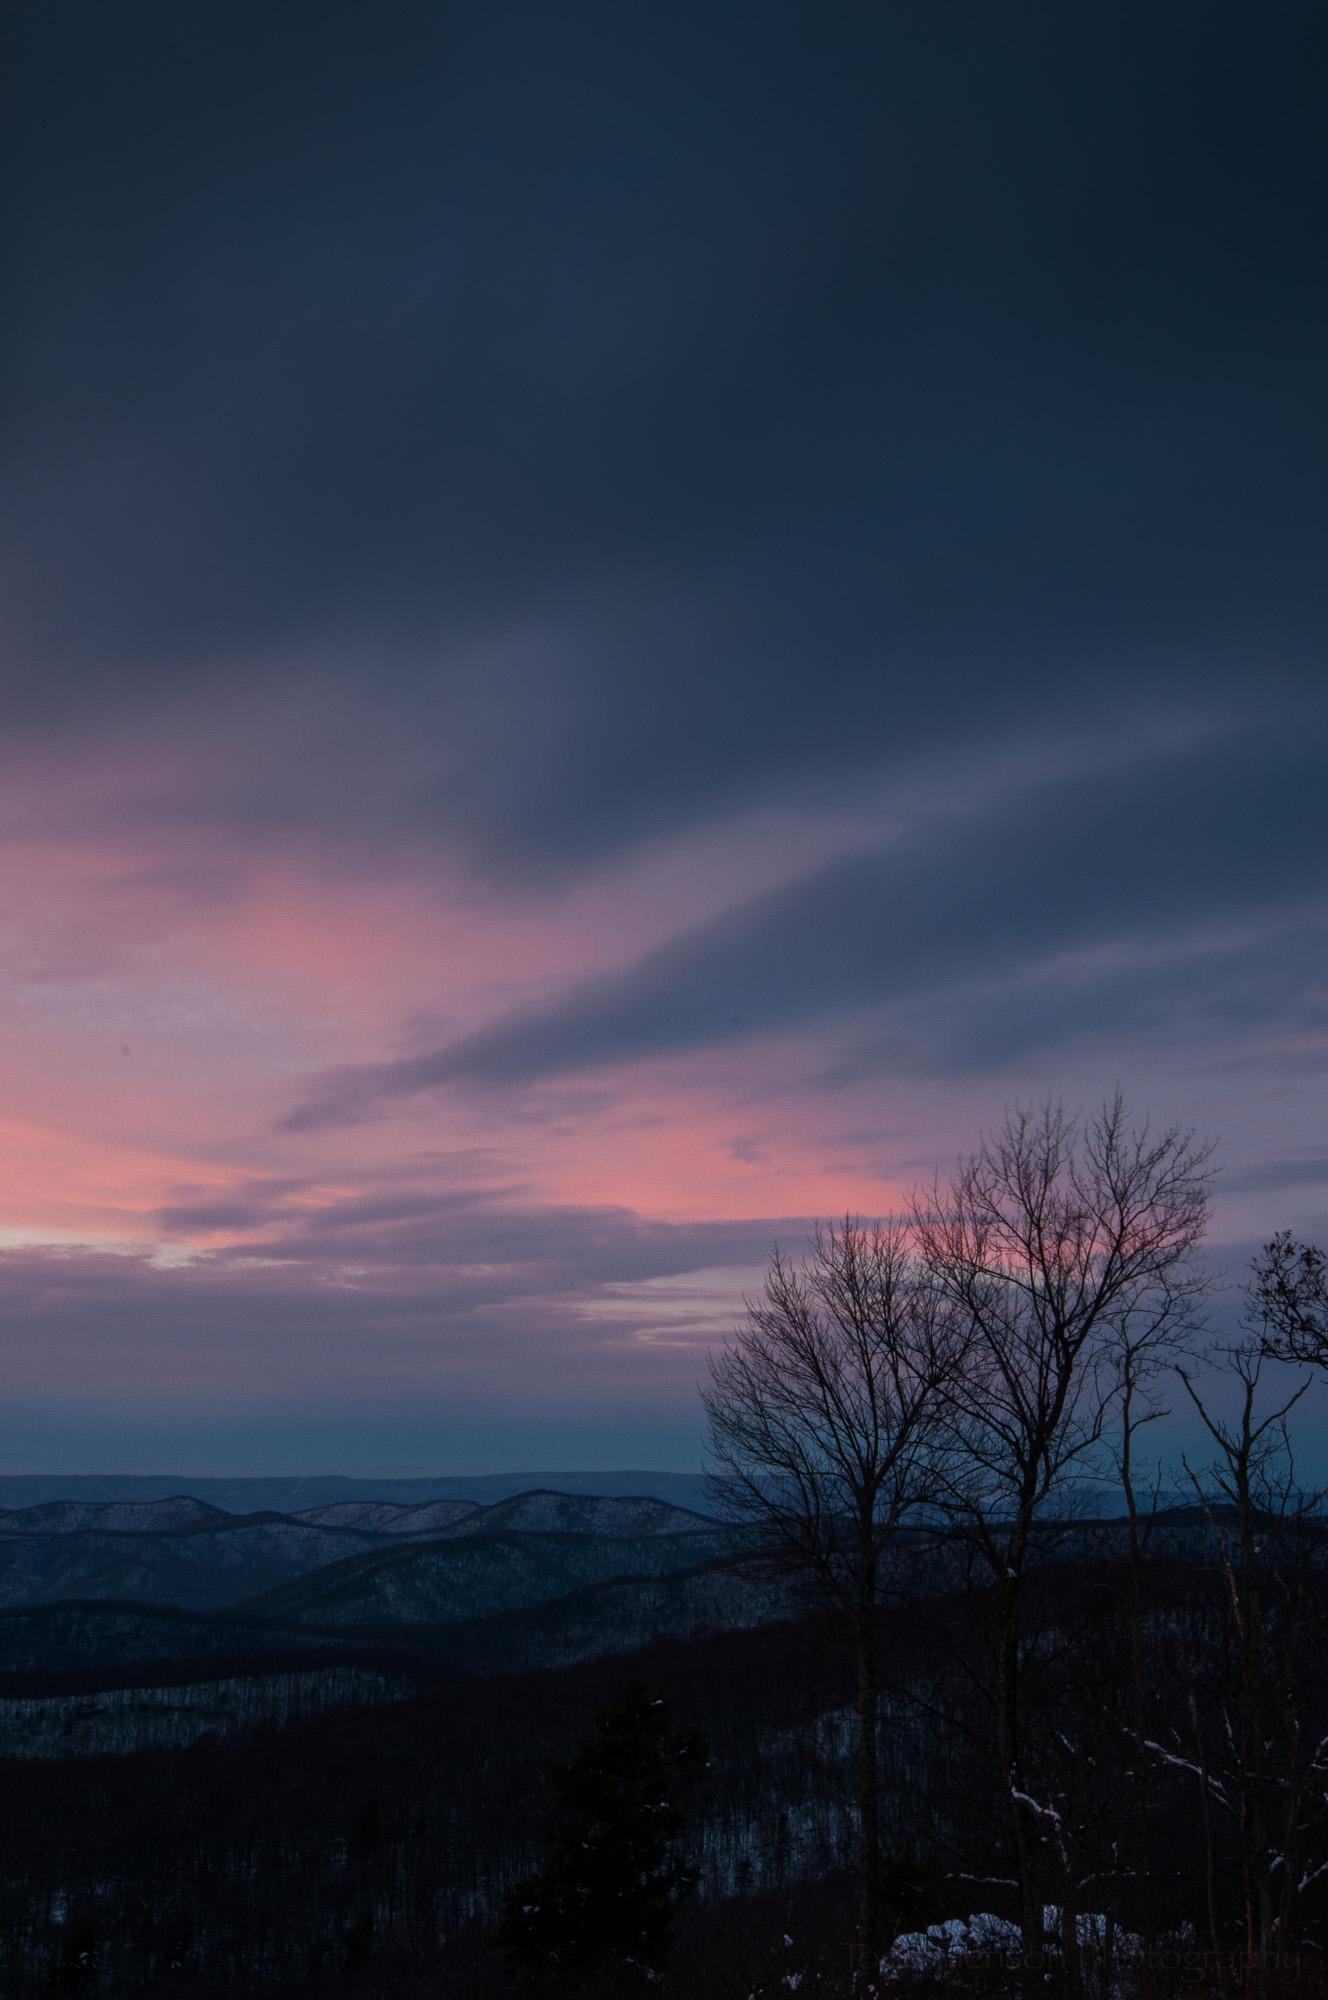 skyline-drive-sunset-8_THP.jpg